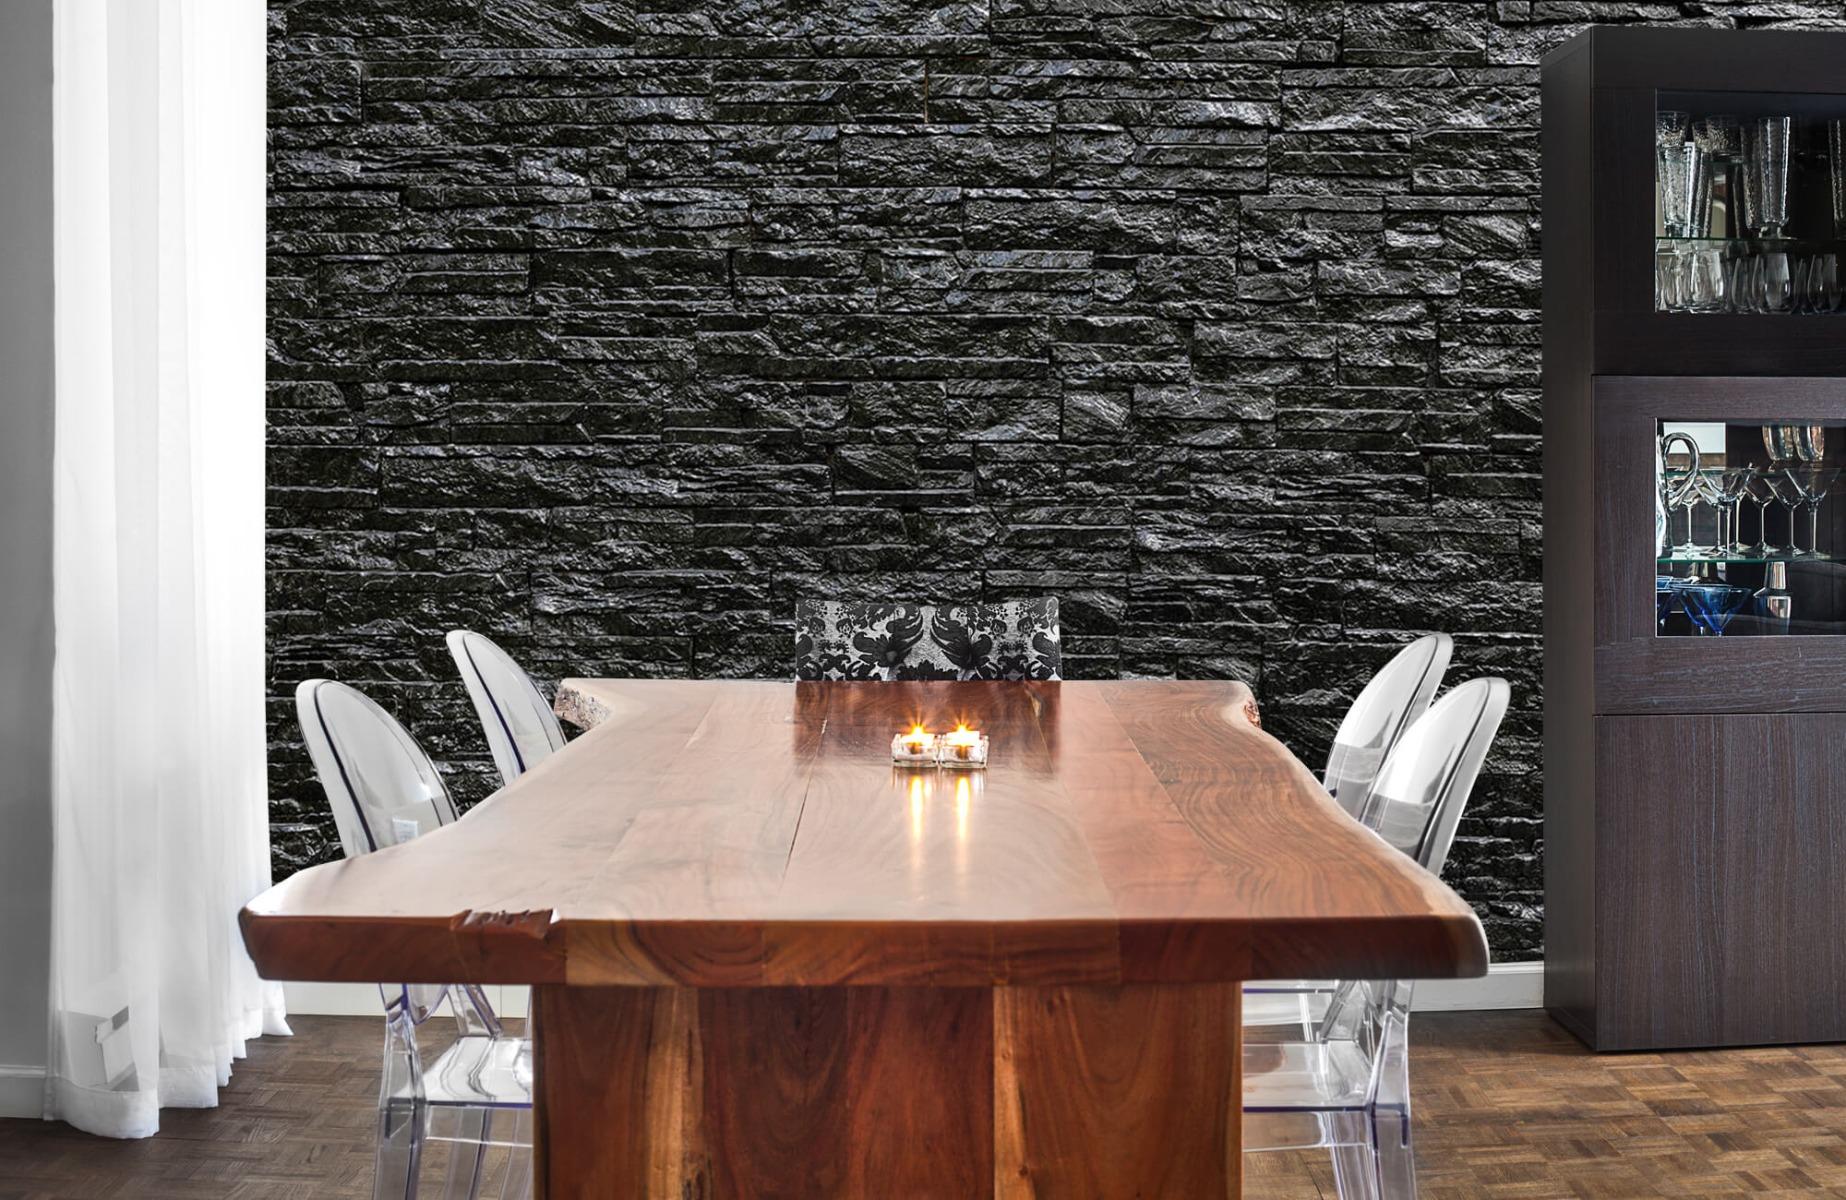 Steen behang - Zwarte stenen - Slaapkamer 3